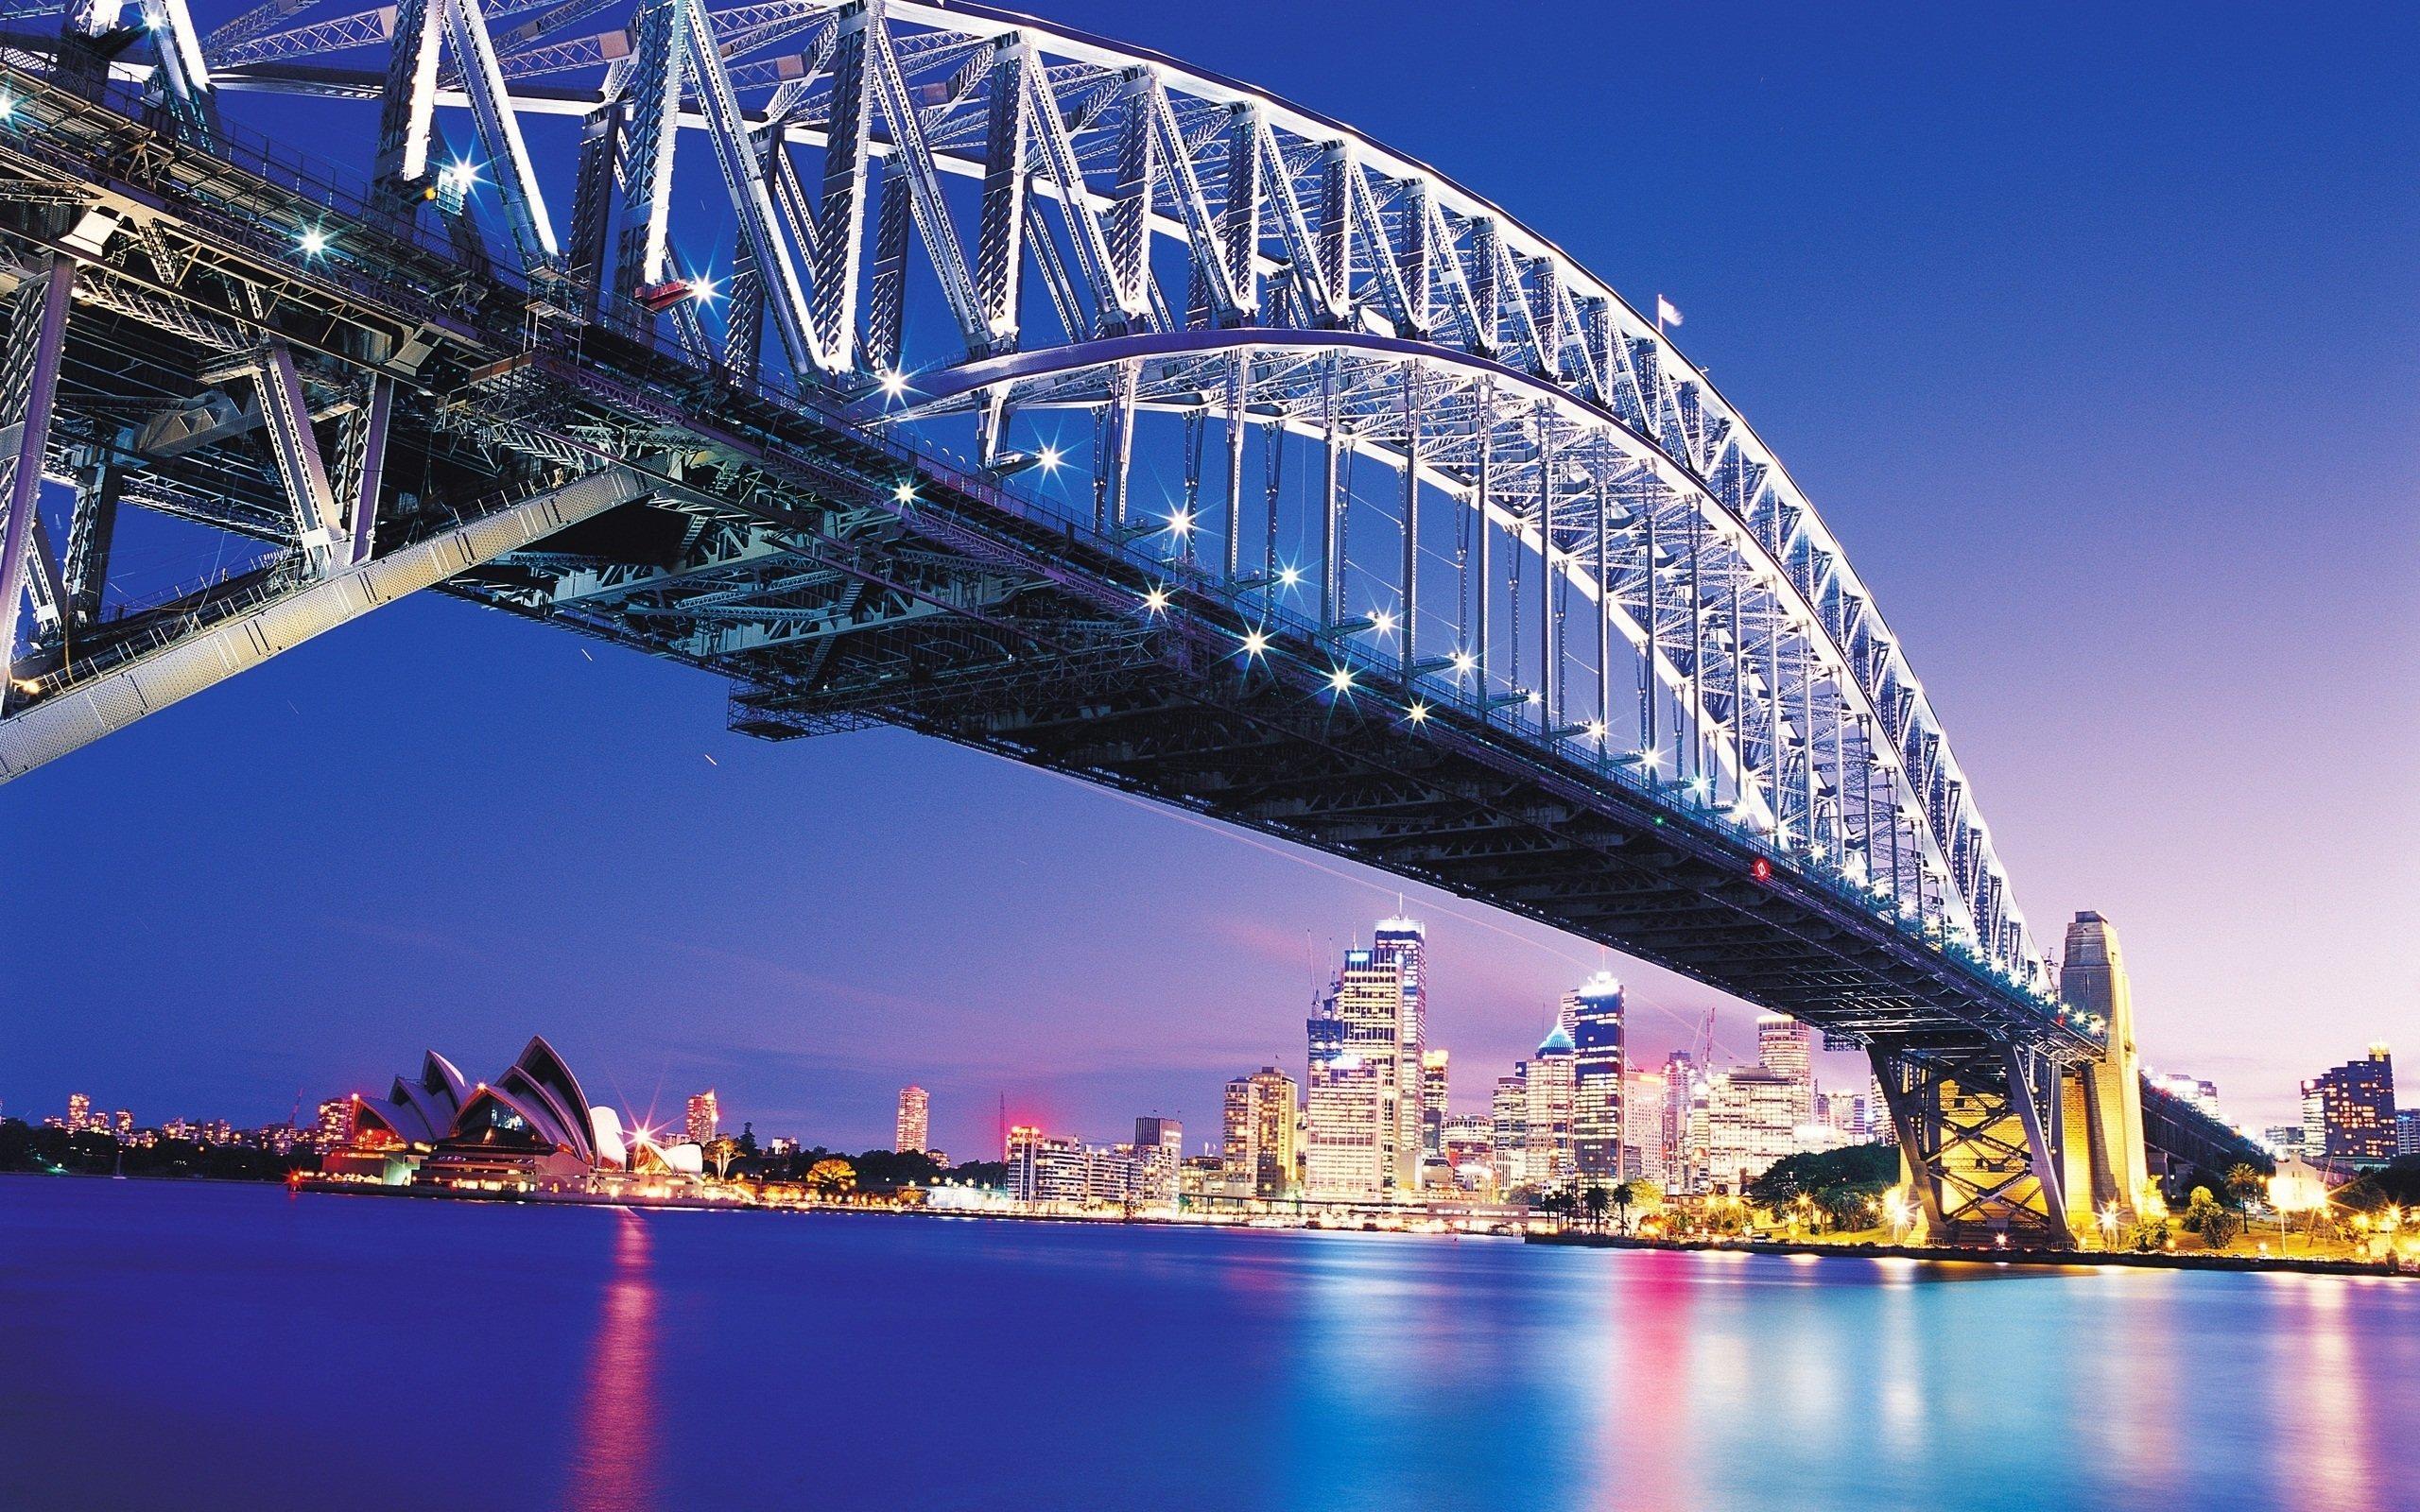 Sydney harbour bridge wallpapers hd for desktop backgrounds download hd 2560x1600 sydney harbour bridge computer background id484897 for free altavistaventures Choice Image